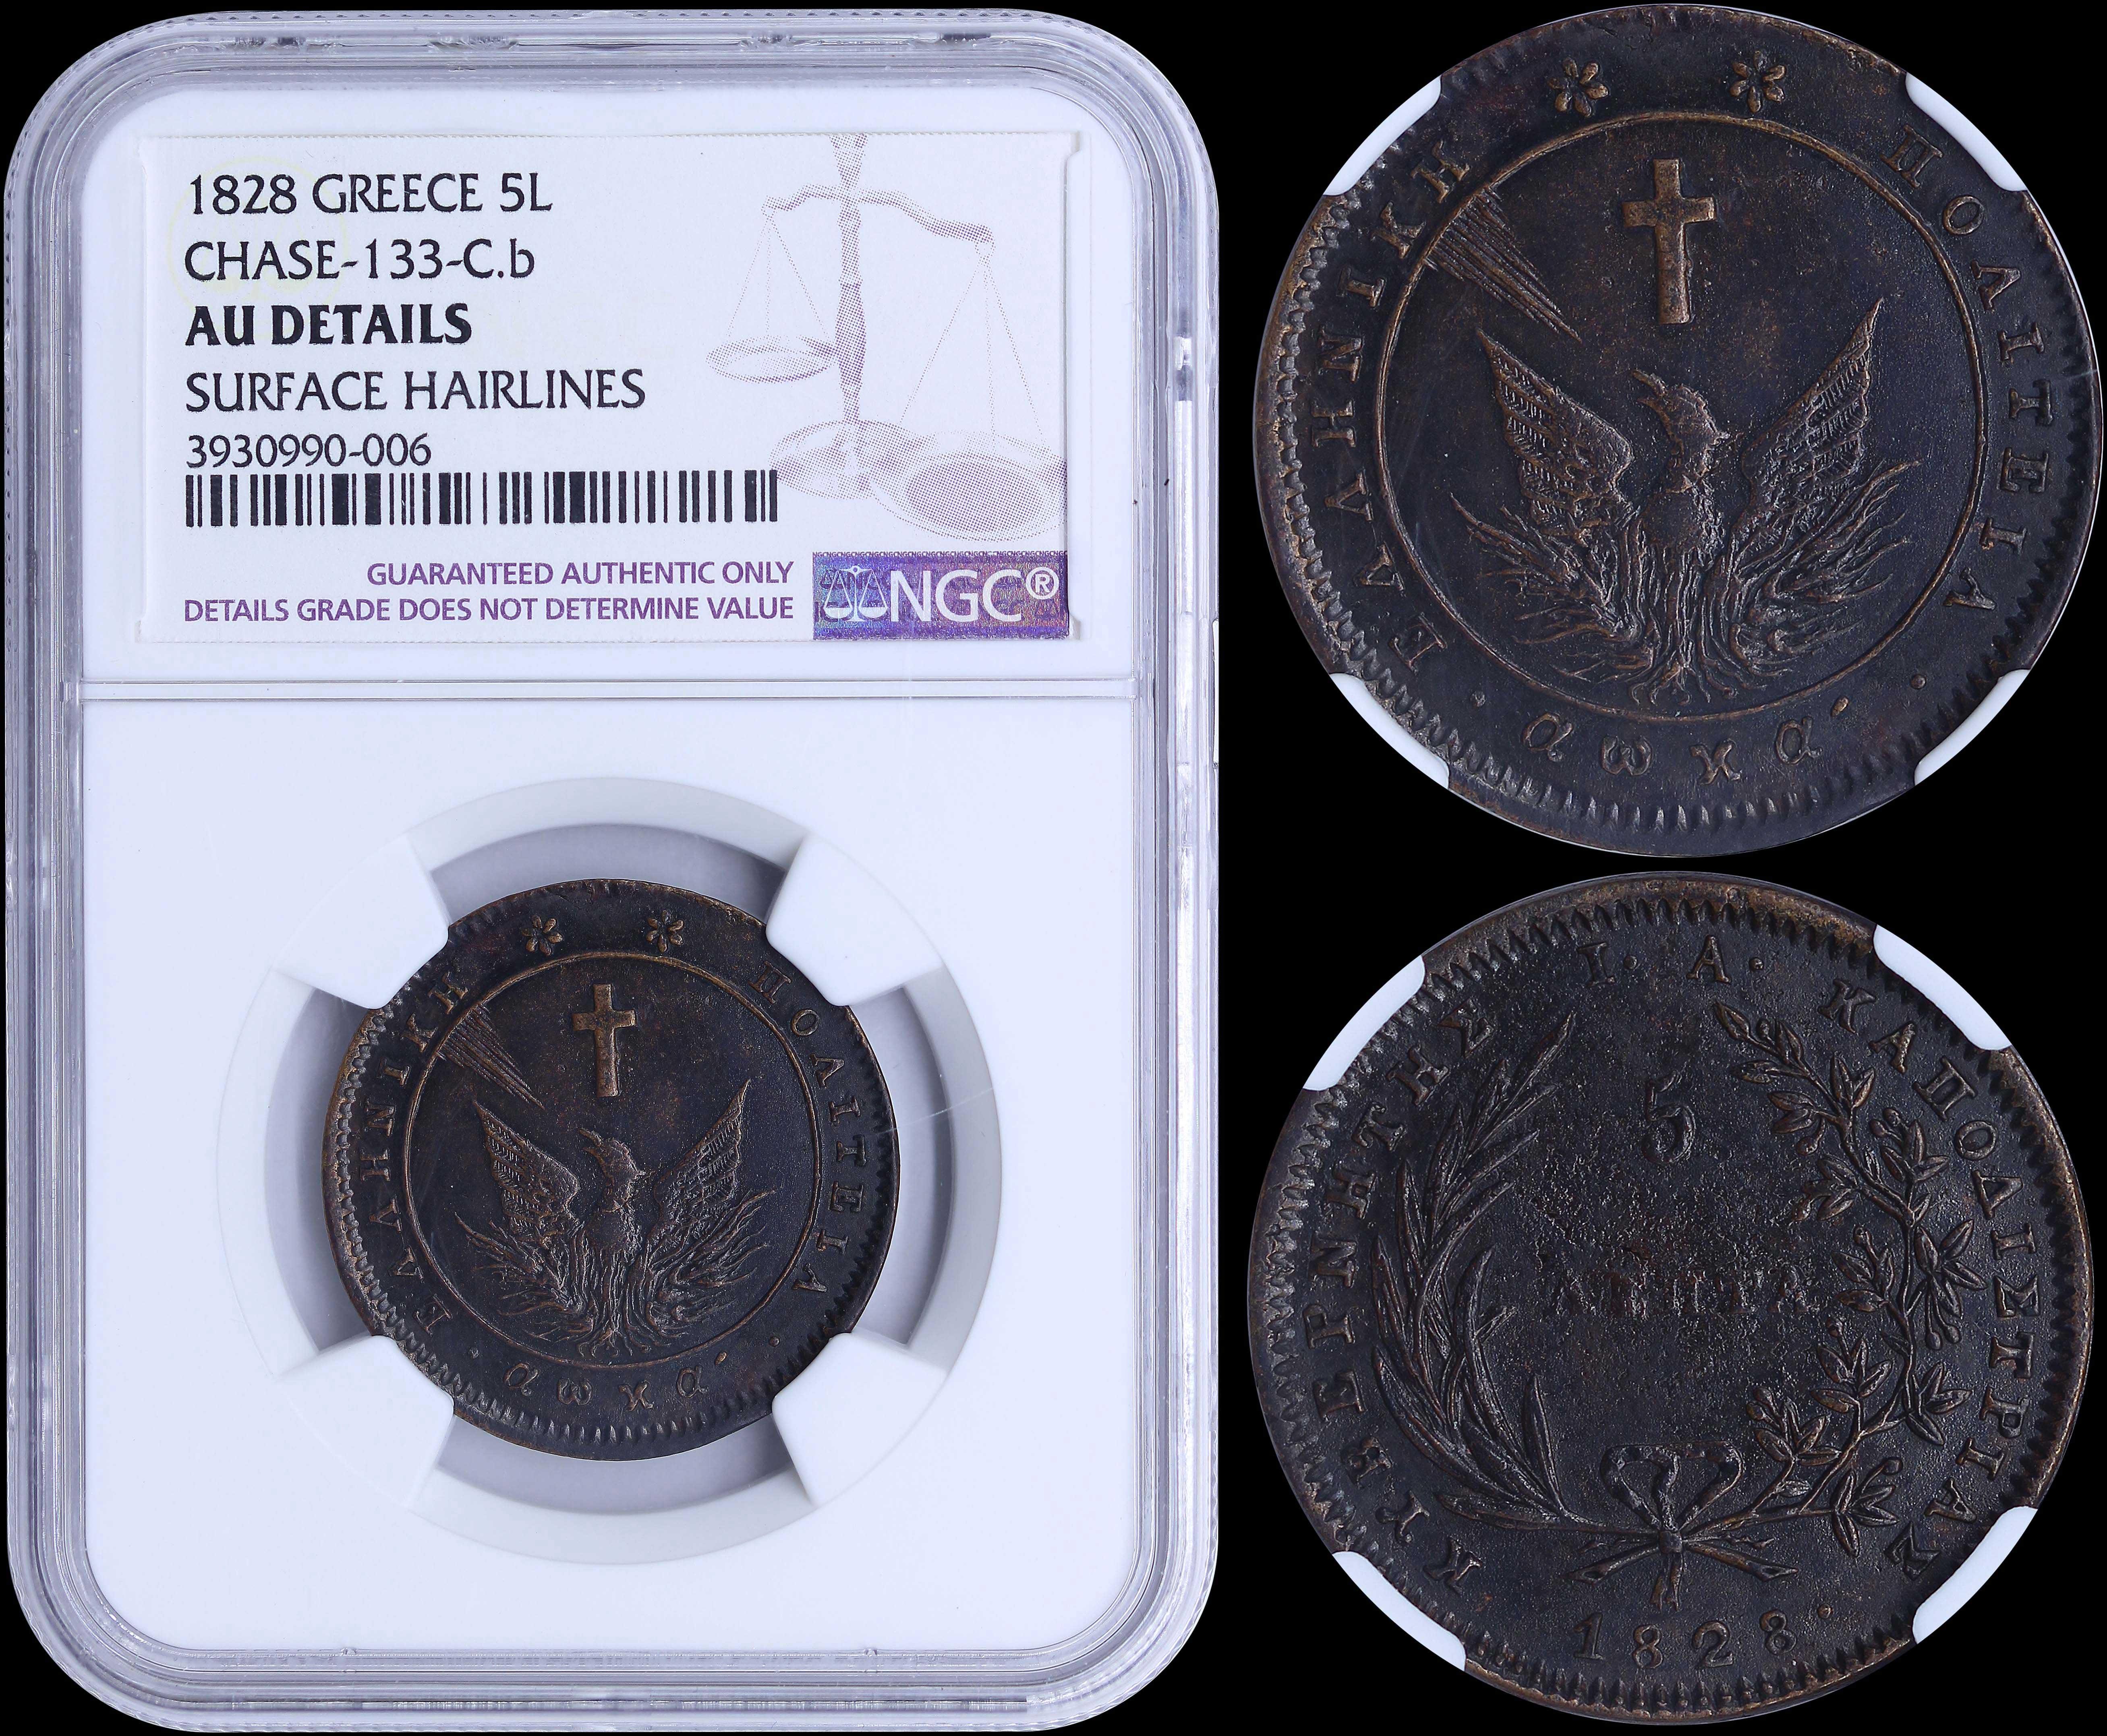 Lot 6003 - -  COINS & TOKENS governor capodistrias -  A. Karamitsos Public & Live Internet Auction 682 (Part A) Coins, Medals & Banknotes